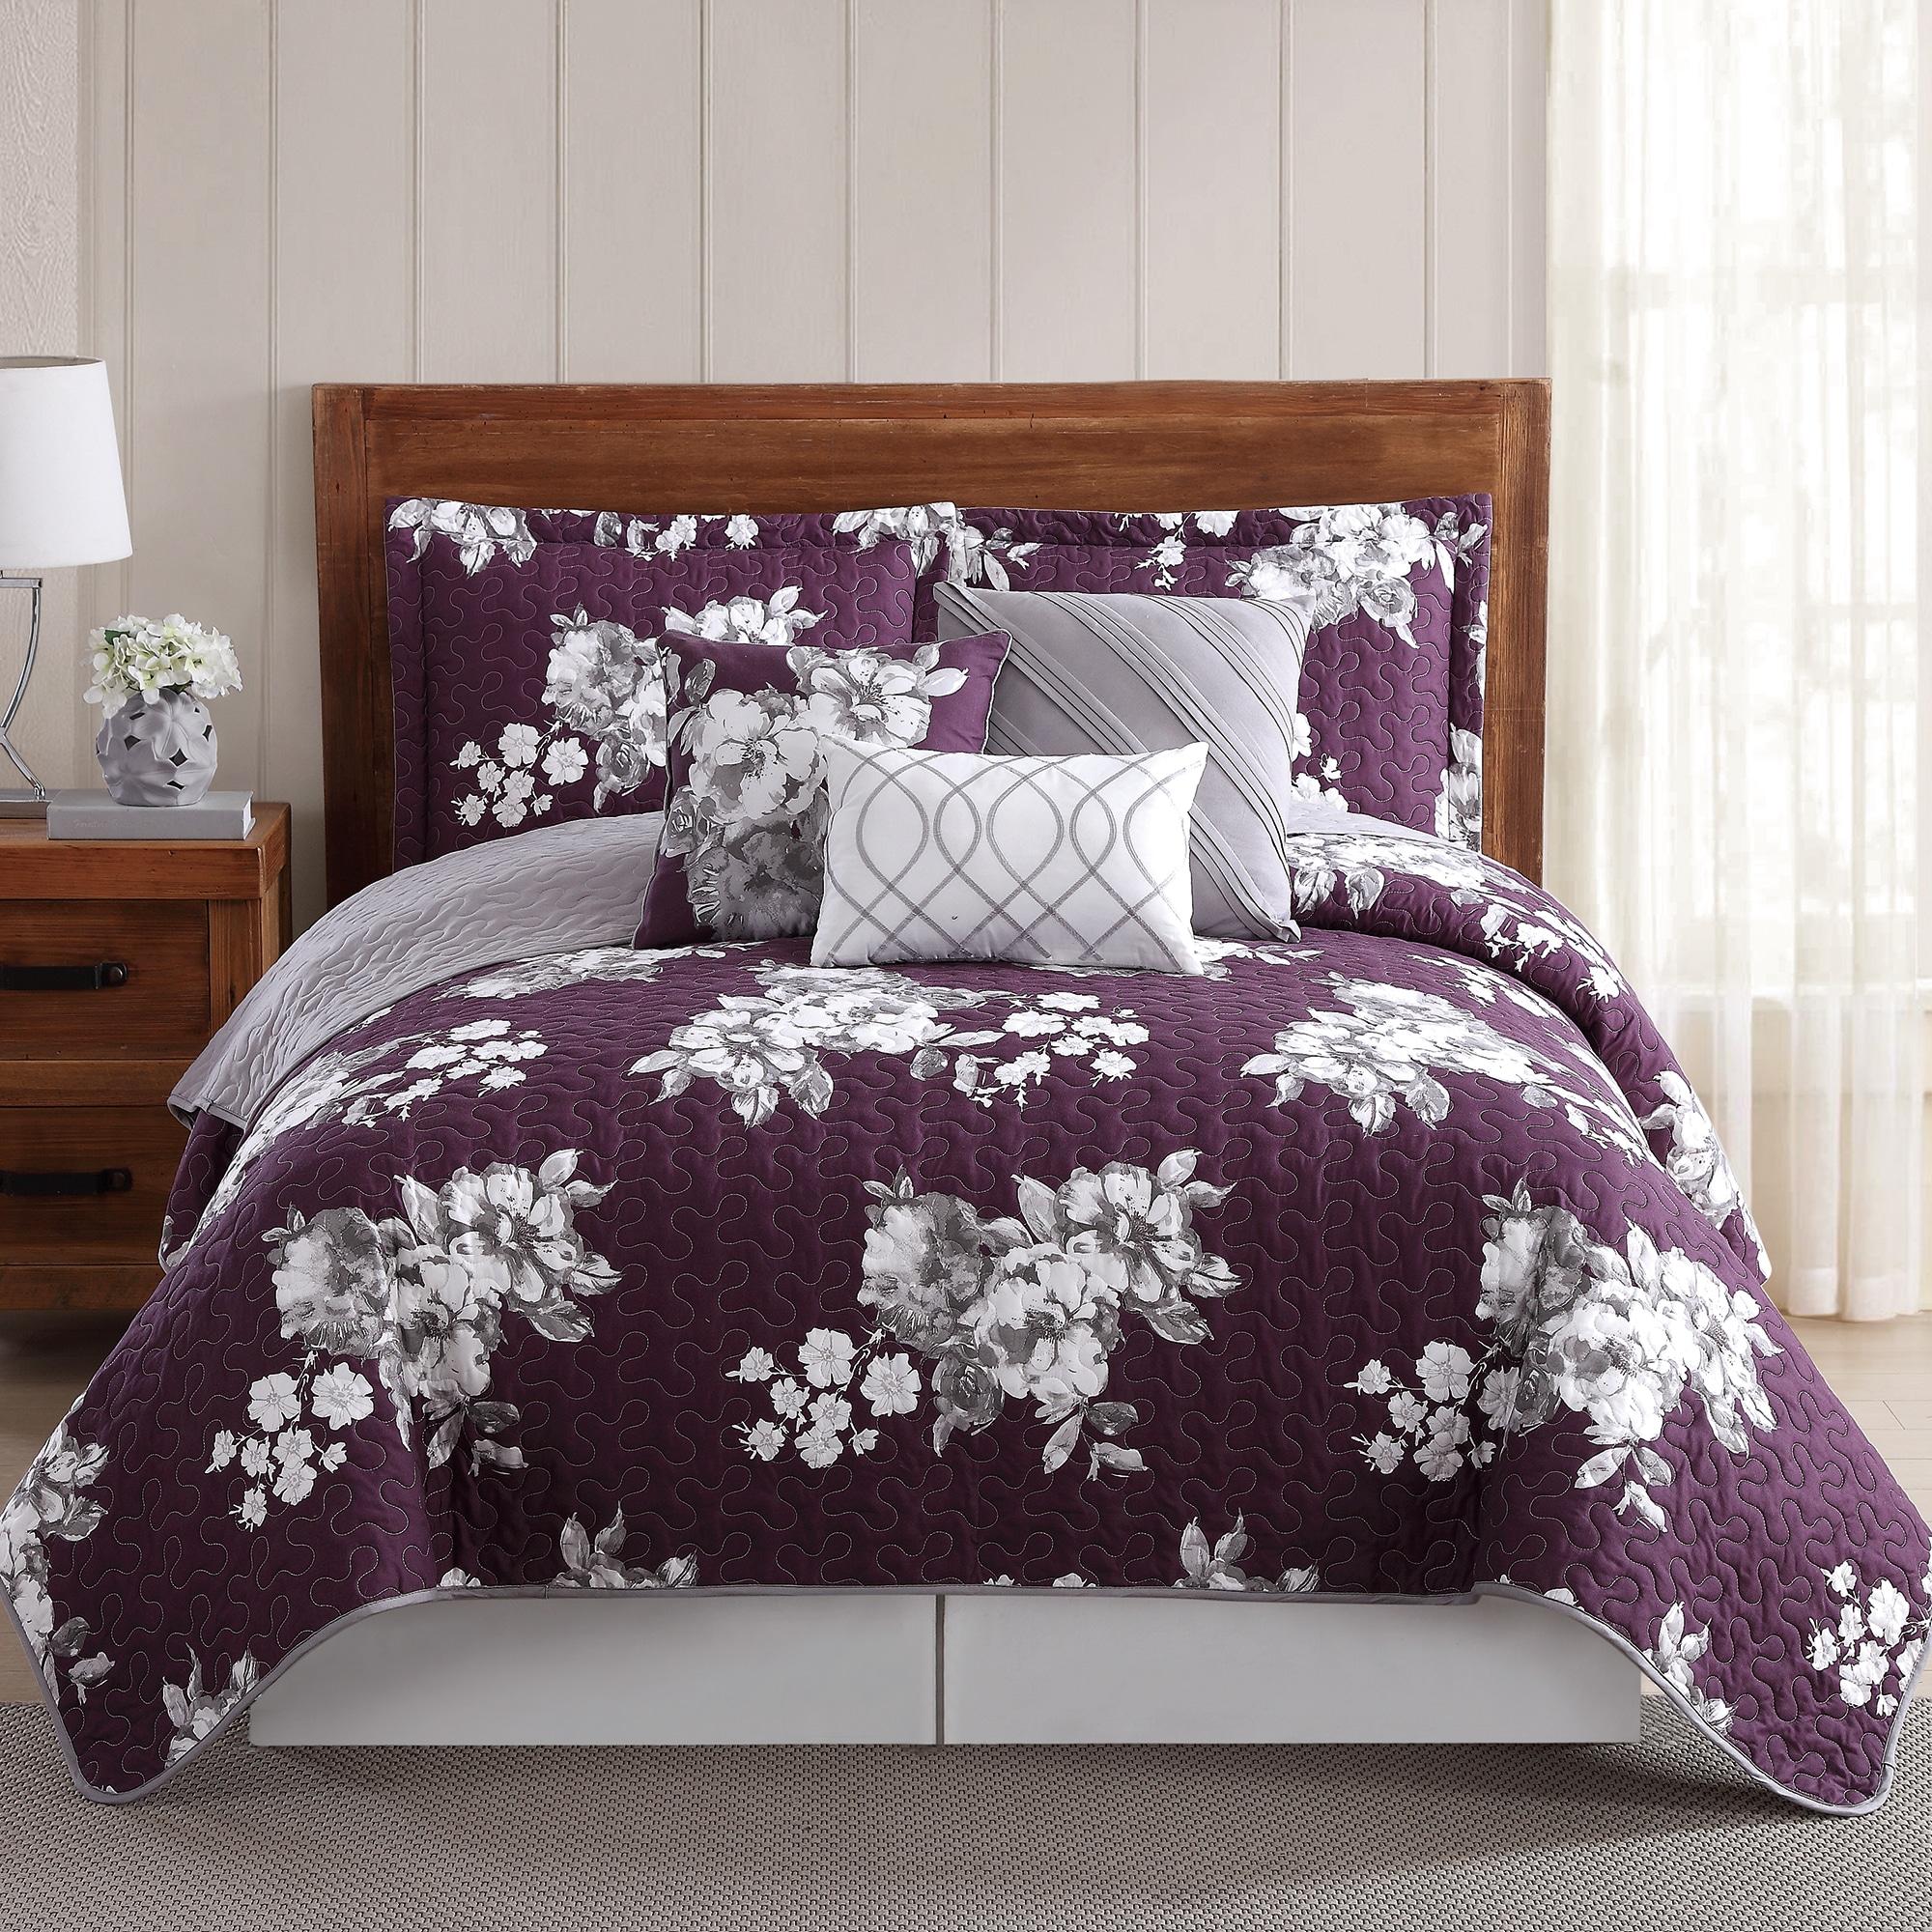 Peony Garden Floral Quilt 6-piece Quilt Set